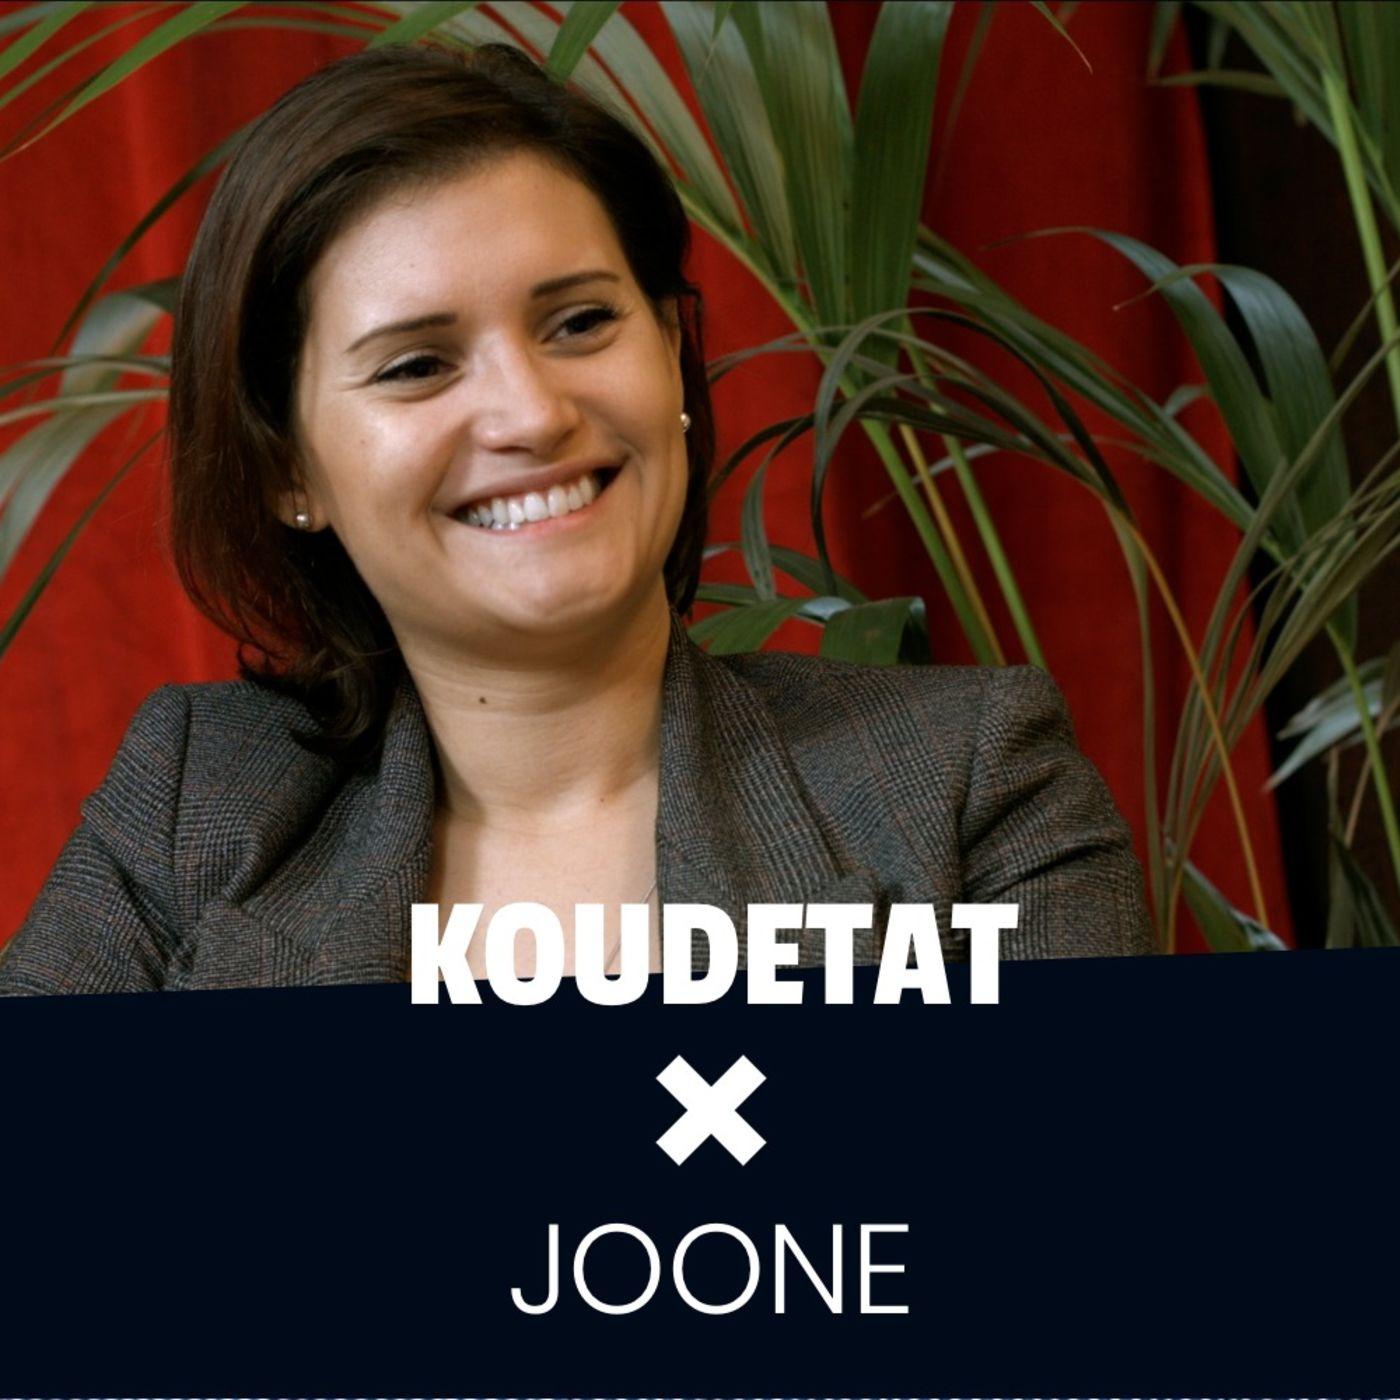 Tu peux allier performance de ta boîte et bienveillance - Koudetat x Joone